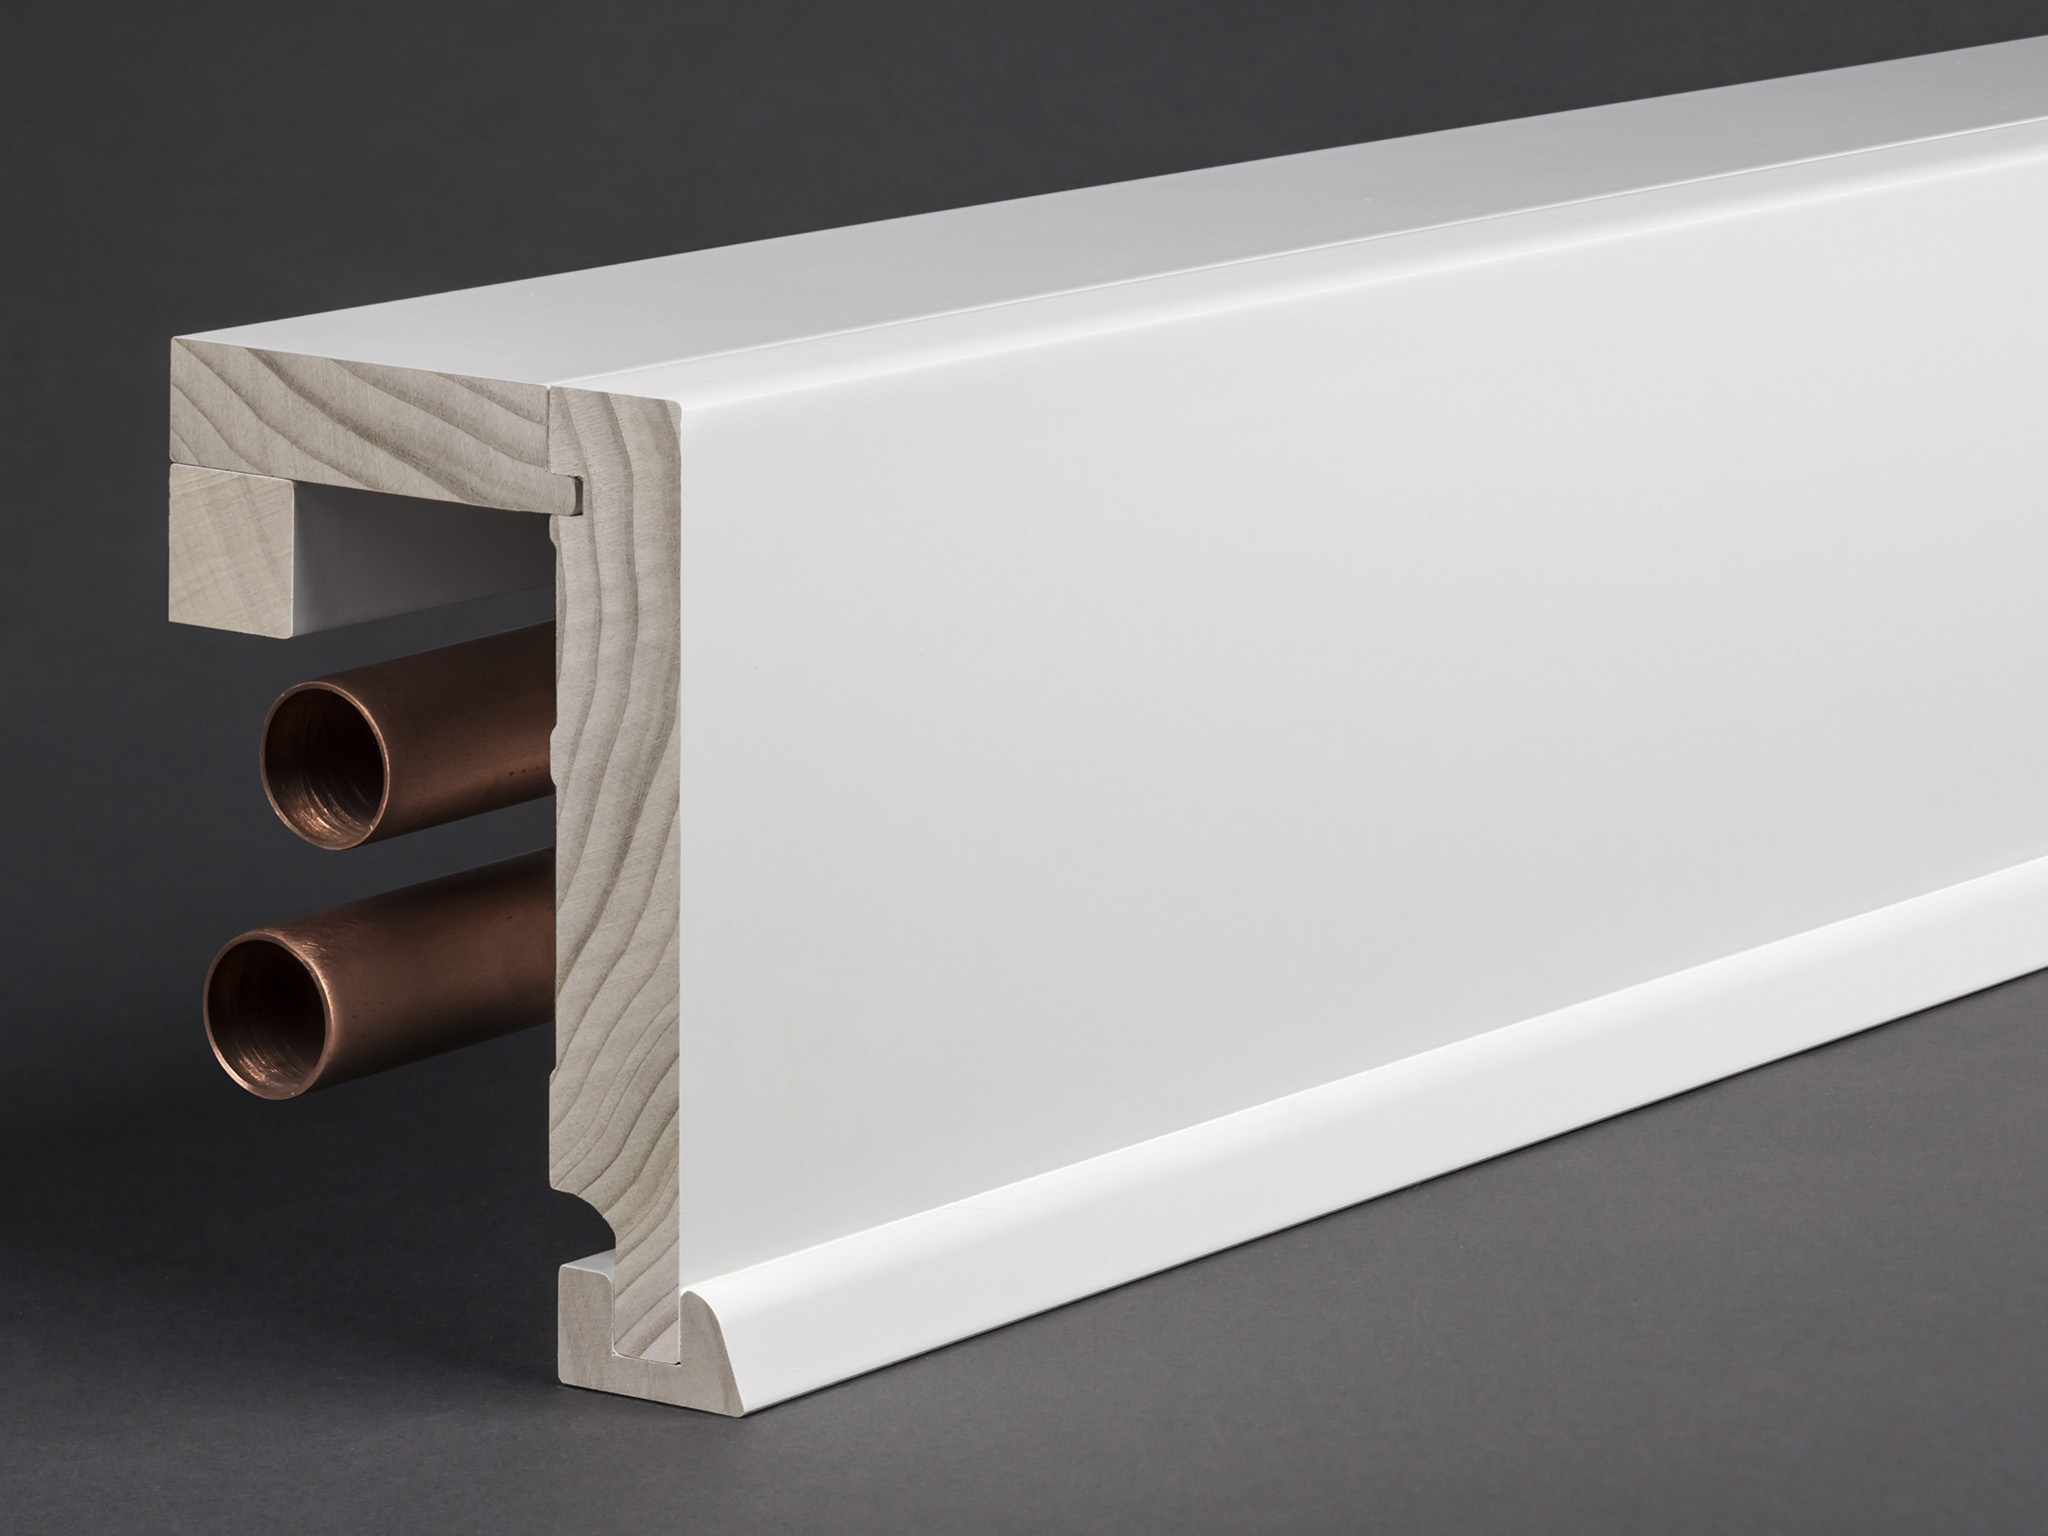 massivholz wei lackiert 85x89 mm rohrabdeckleiste. Black Bedroom Furniture Sets. Home Design Ideas